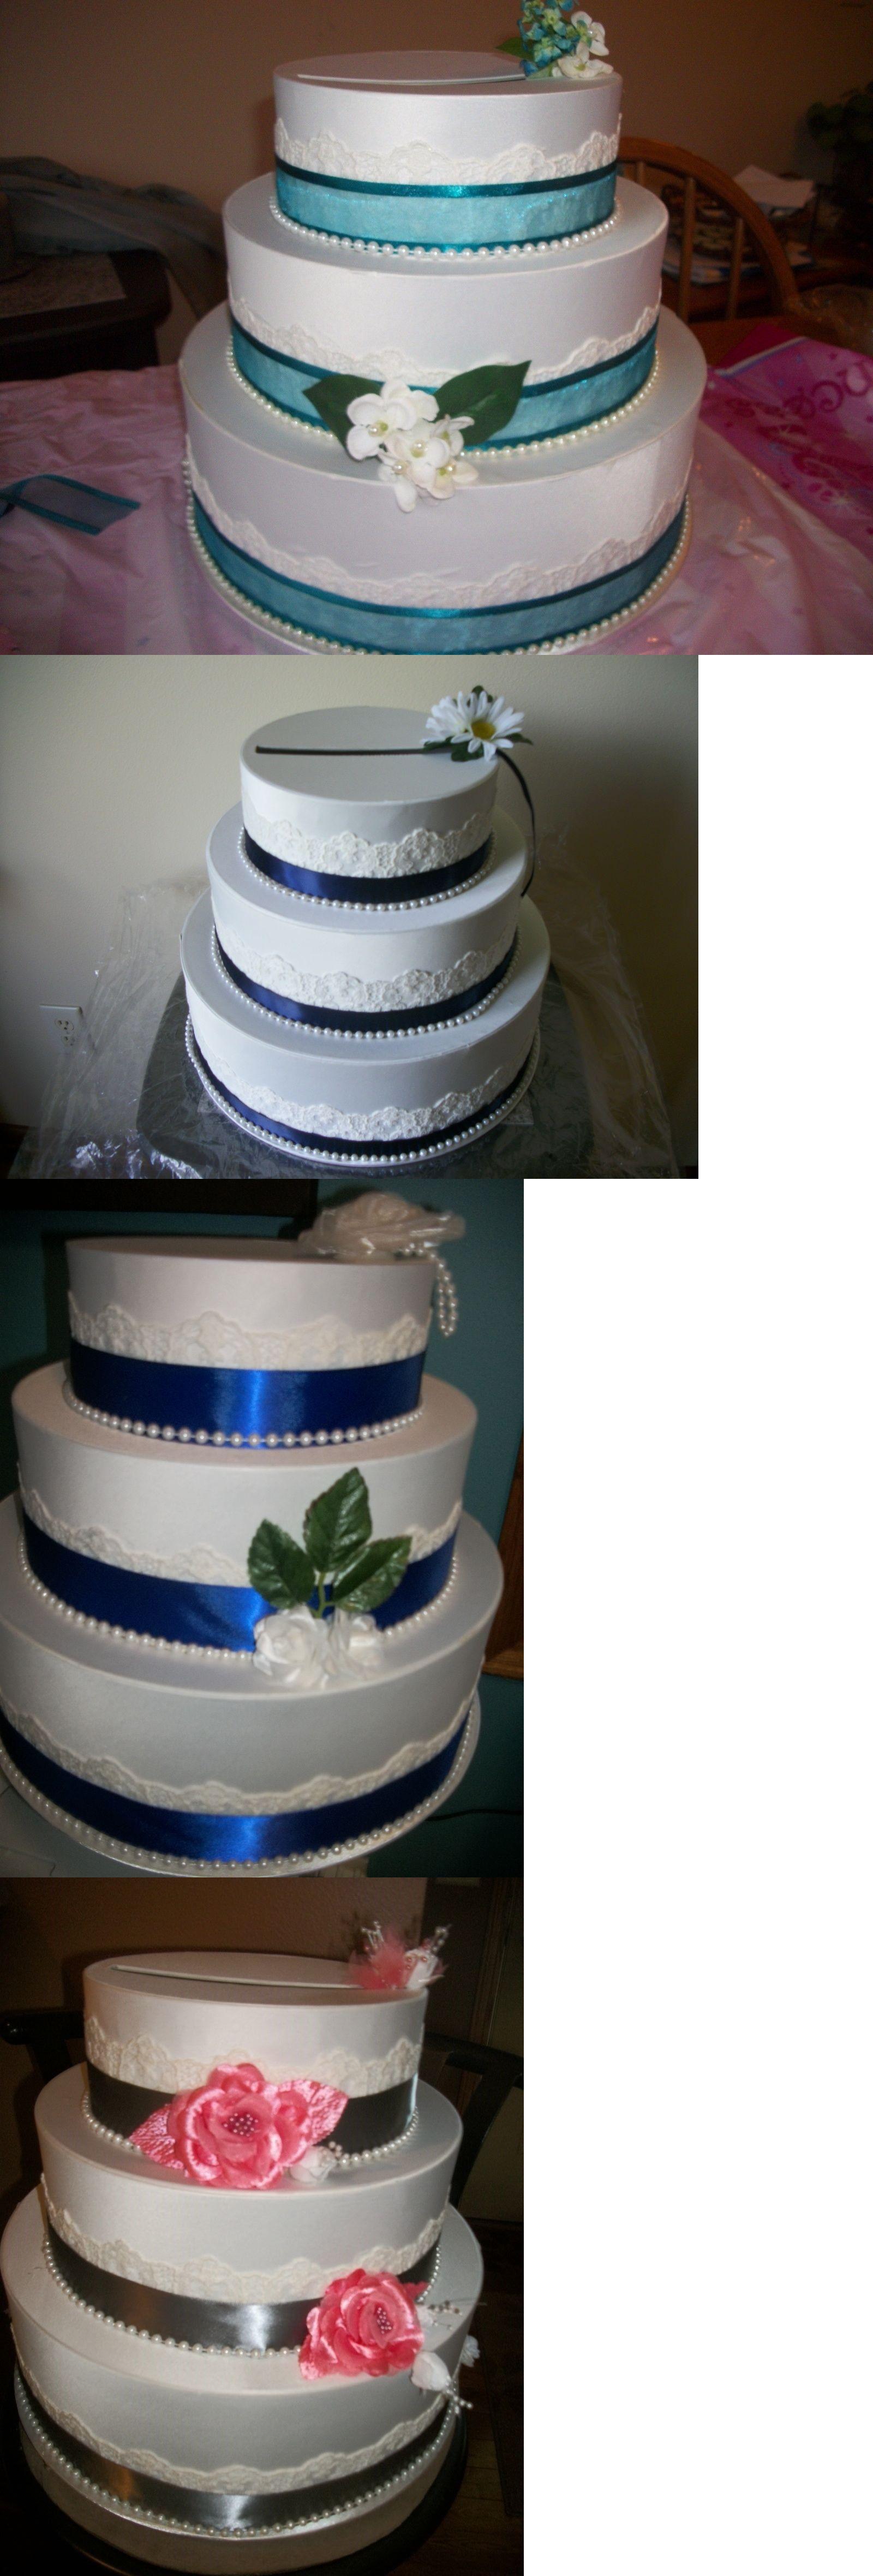 Card Boxes and Wishing Wells Custom Made 3 Tier Wedding